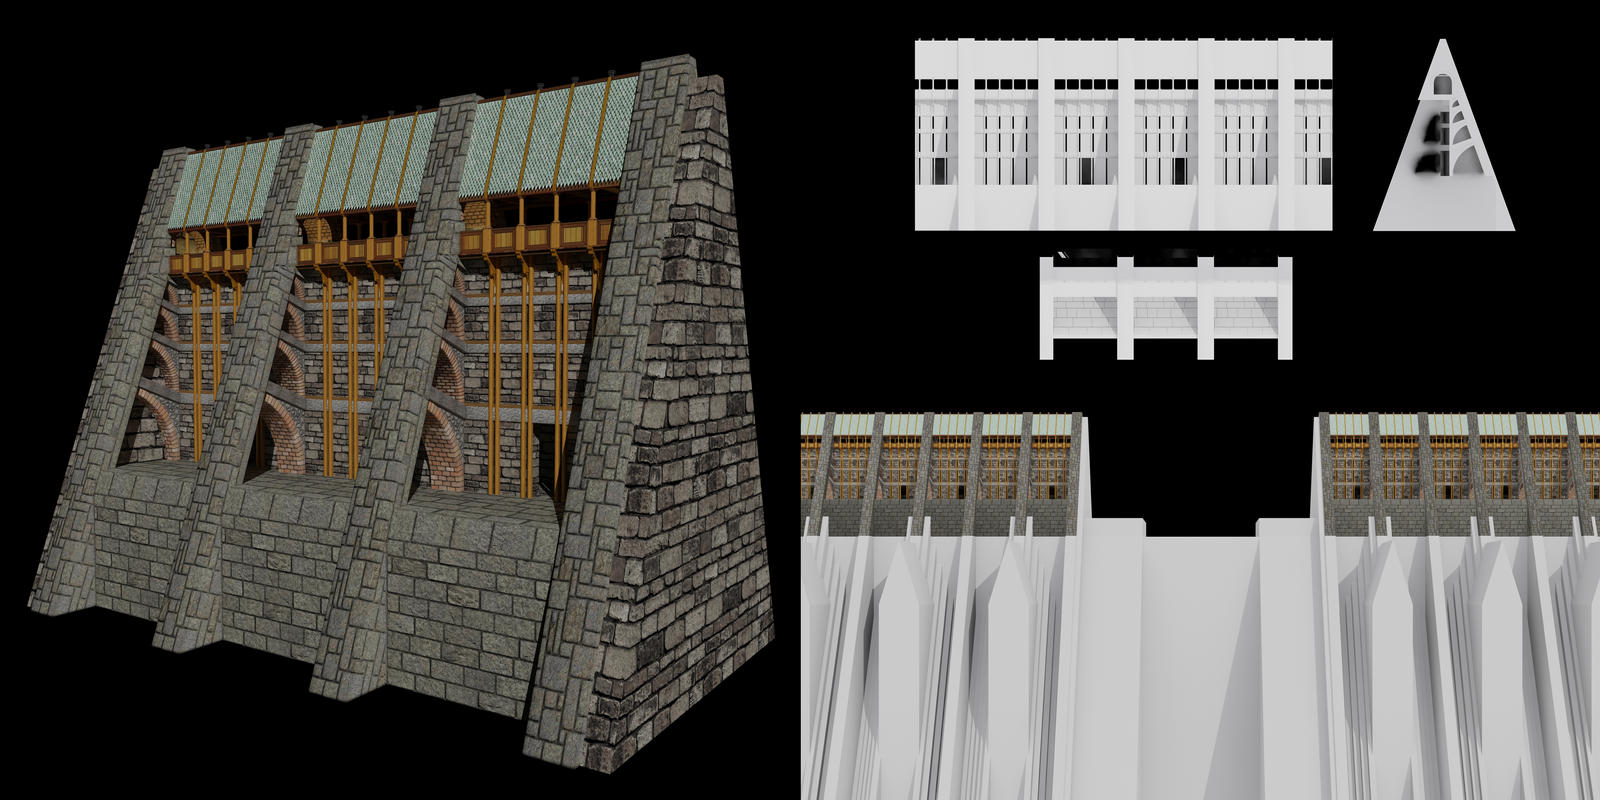 griphus___city_walls_study__3_by_vashar23-d60fcy7.jpg